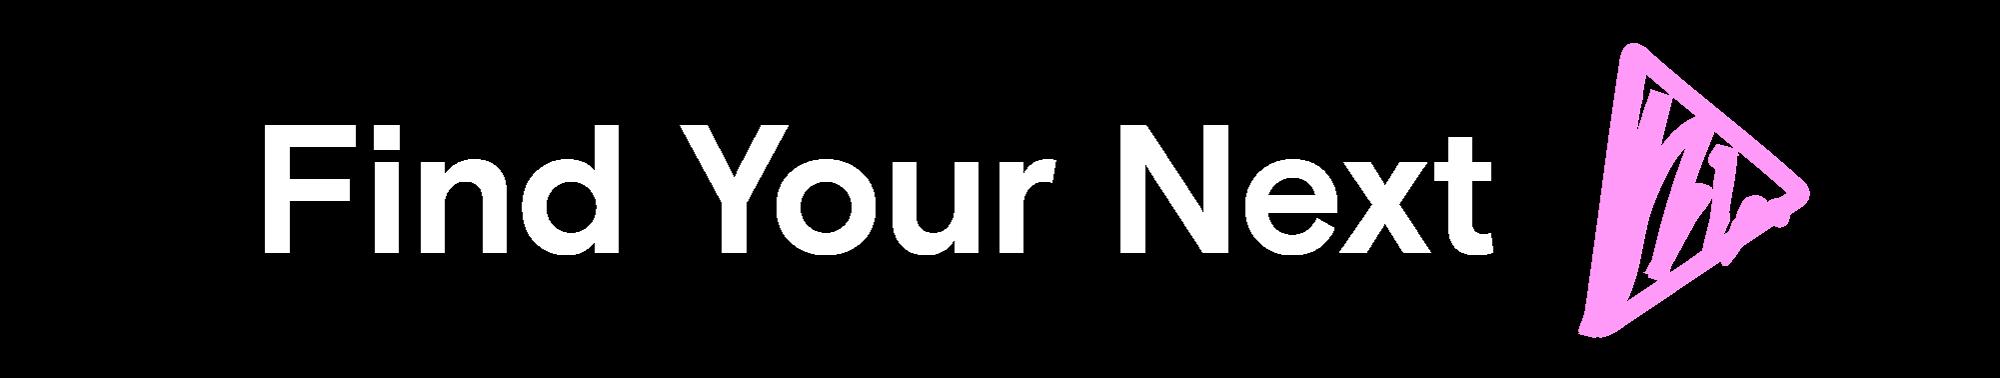 KR-Website-fyn-header.png